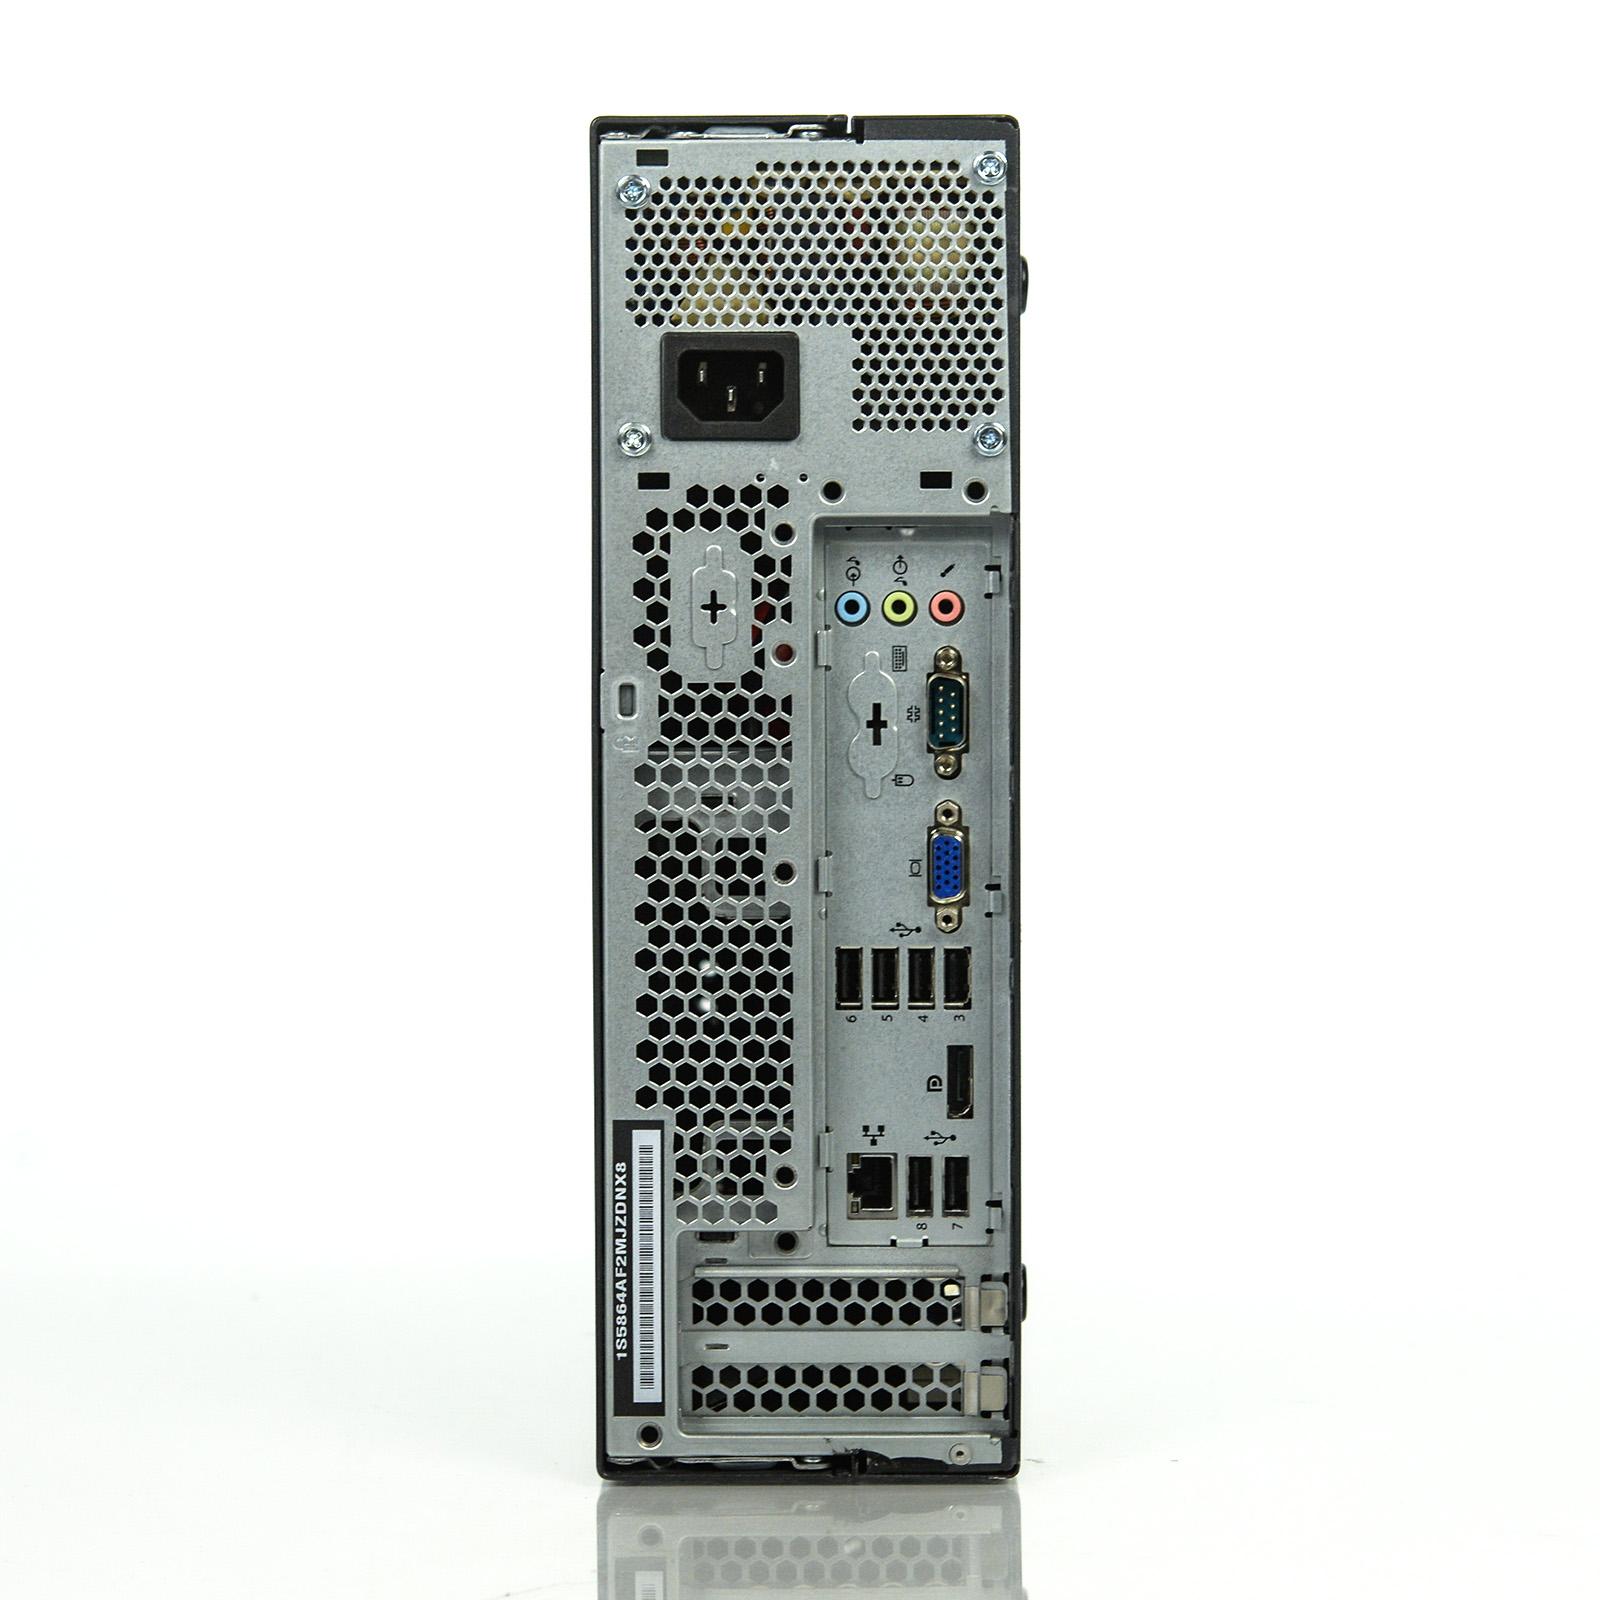 Refurbished Lenovo Thinkcentre M90p Sff I5 650 320ghz Wi Fi 4gb A328 Black 128gb Ssd Win 10 Pro 1 Yr Wty